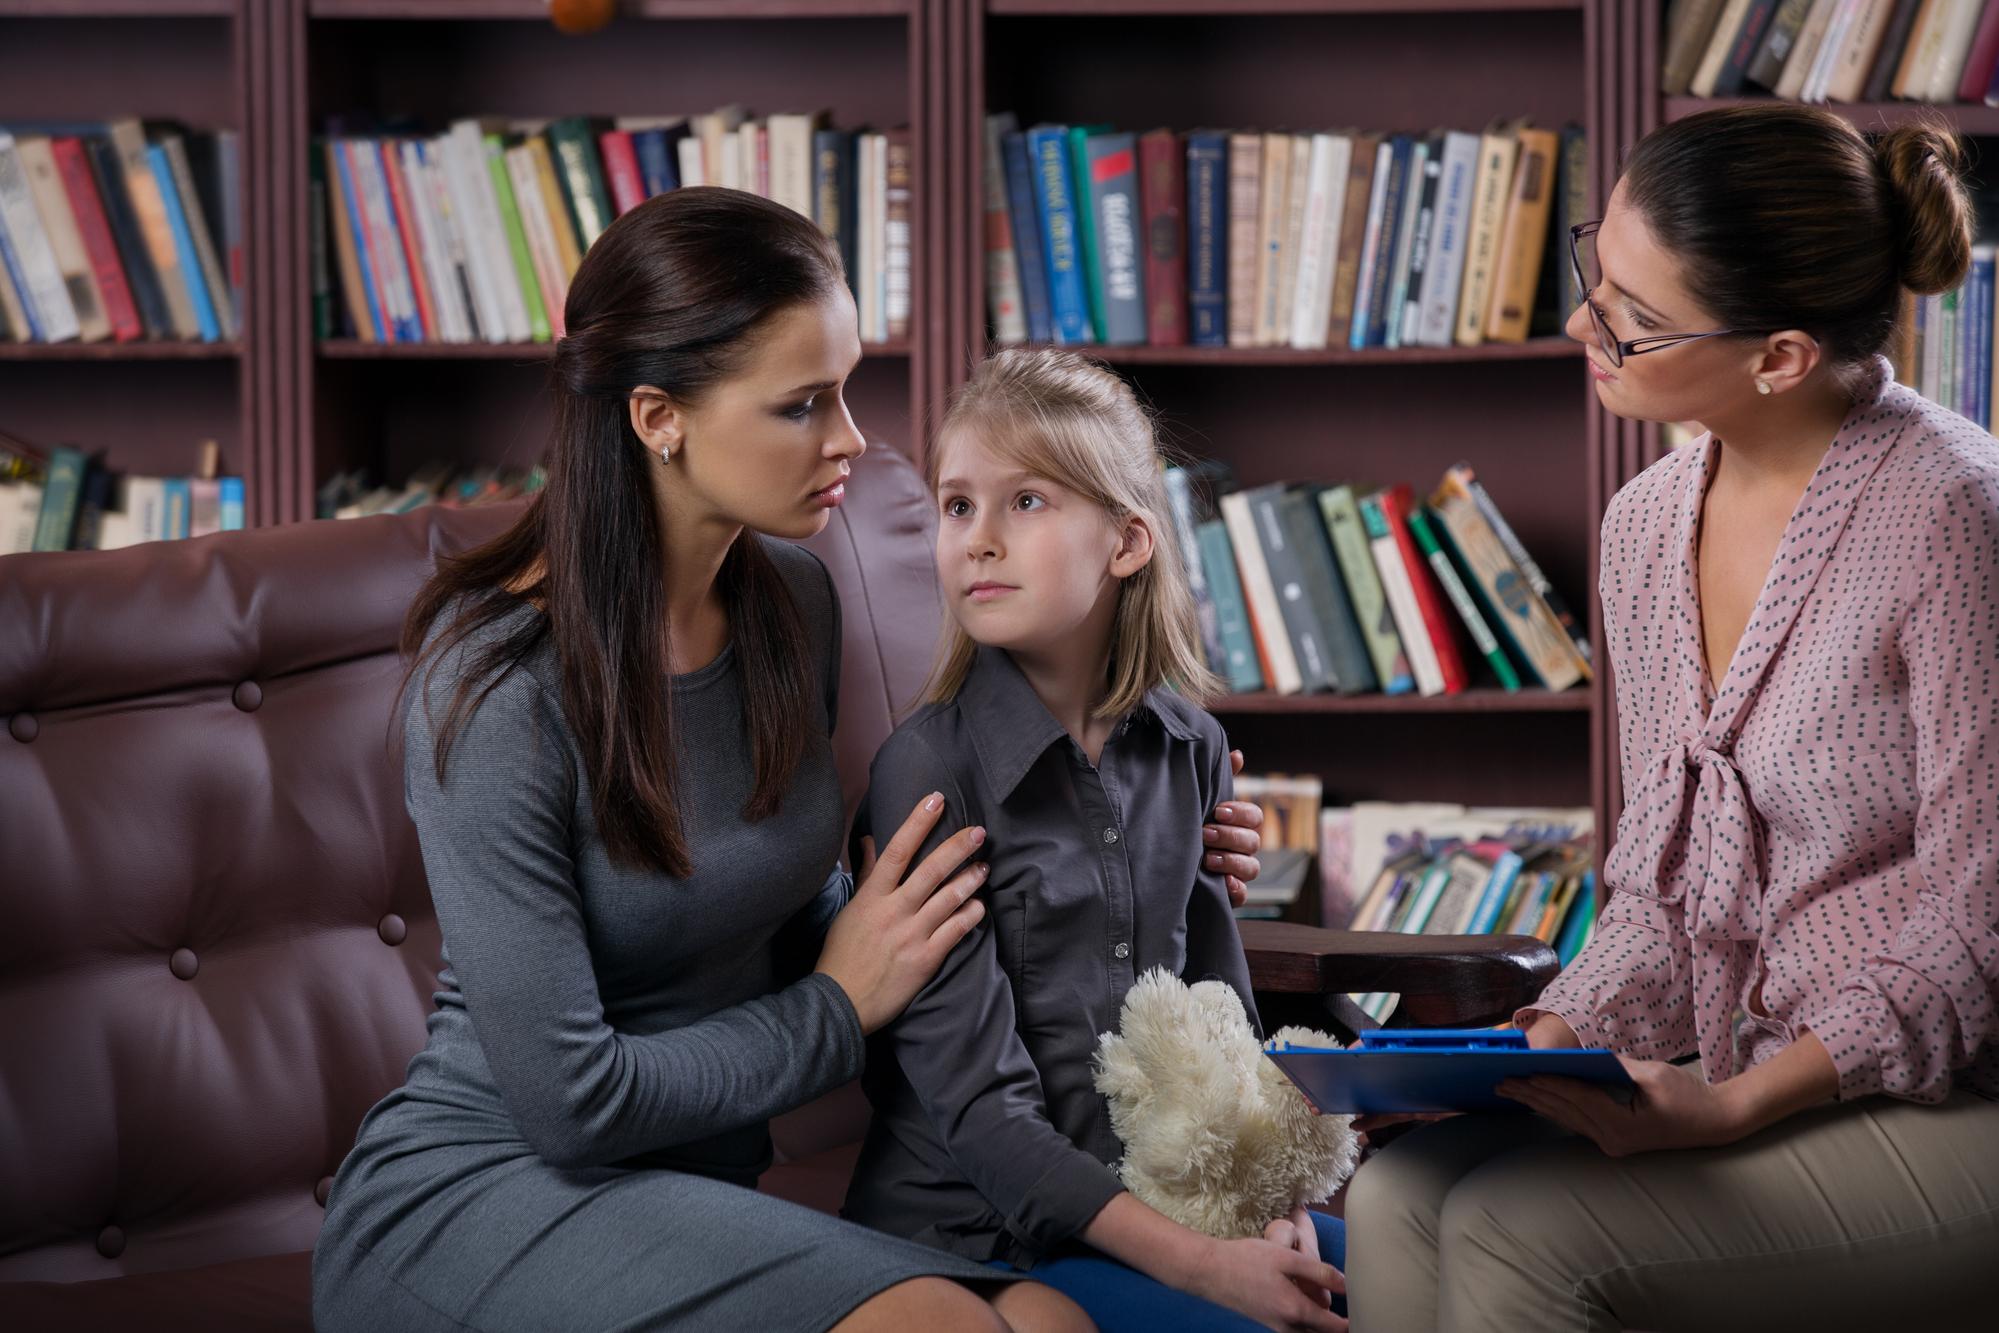 Can DSS Interview My Minor Children? - Raleigh Divorce Lawyers